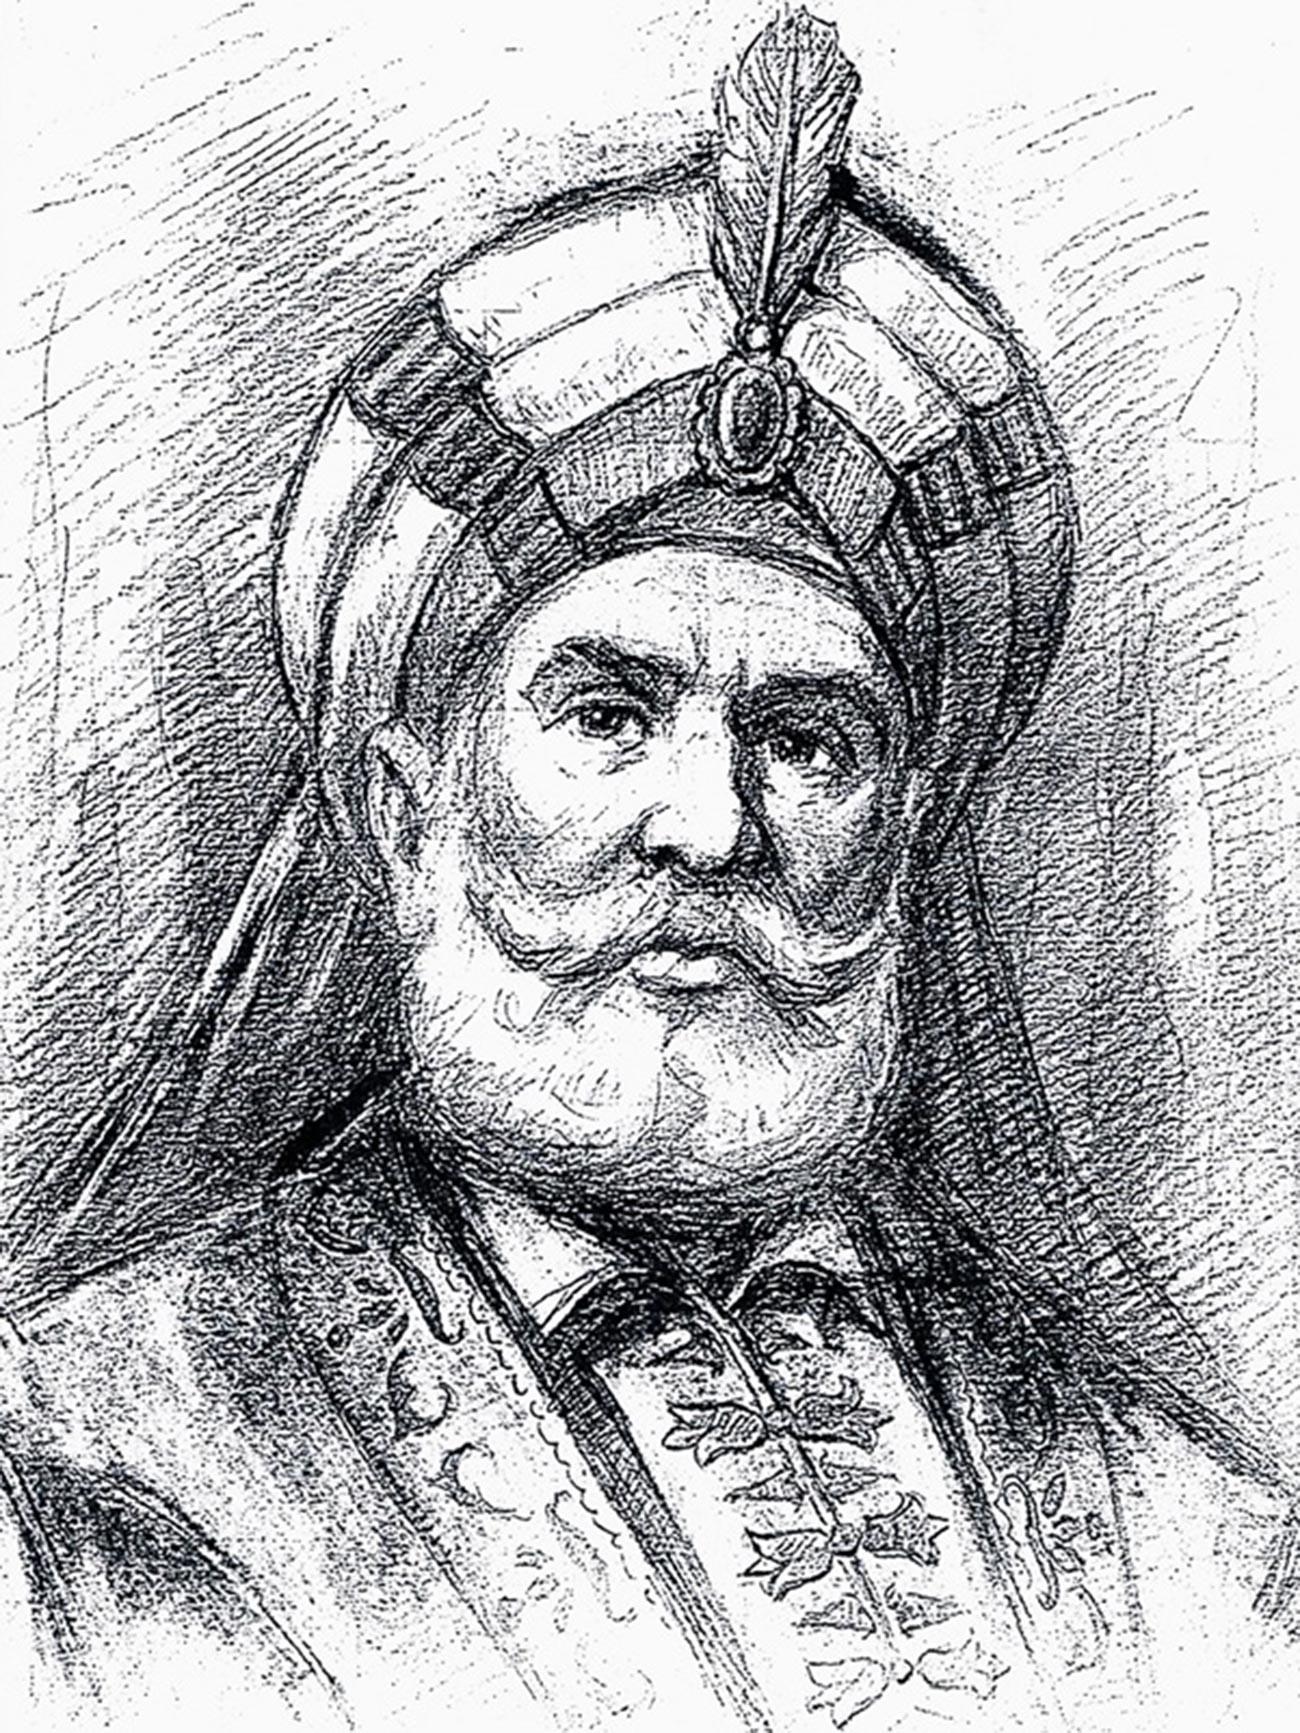 Портрет на Захир ал Умар аз Зейдани